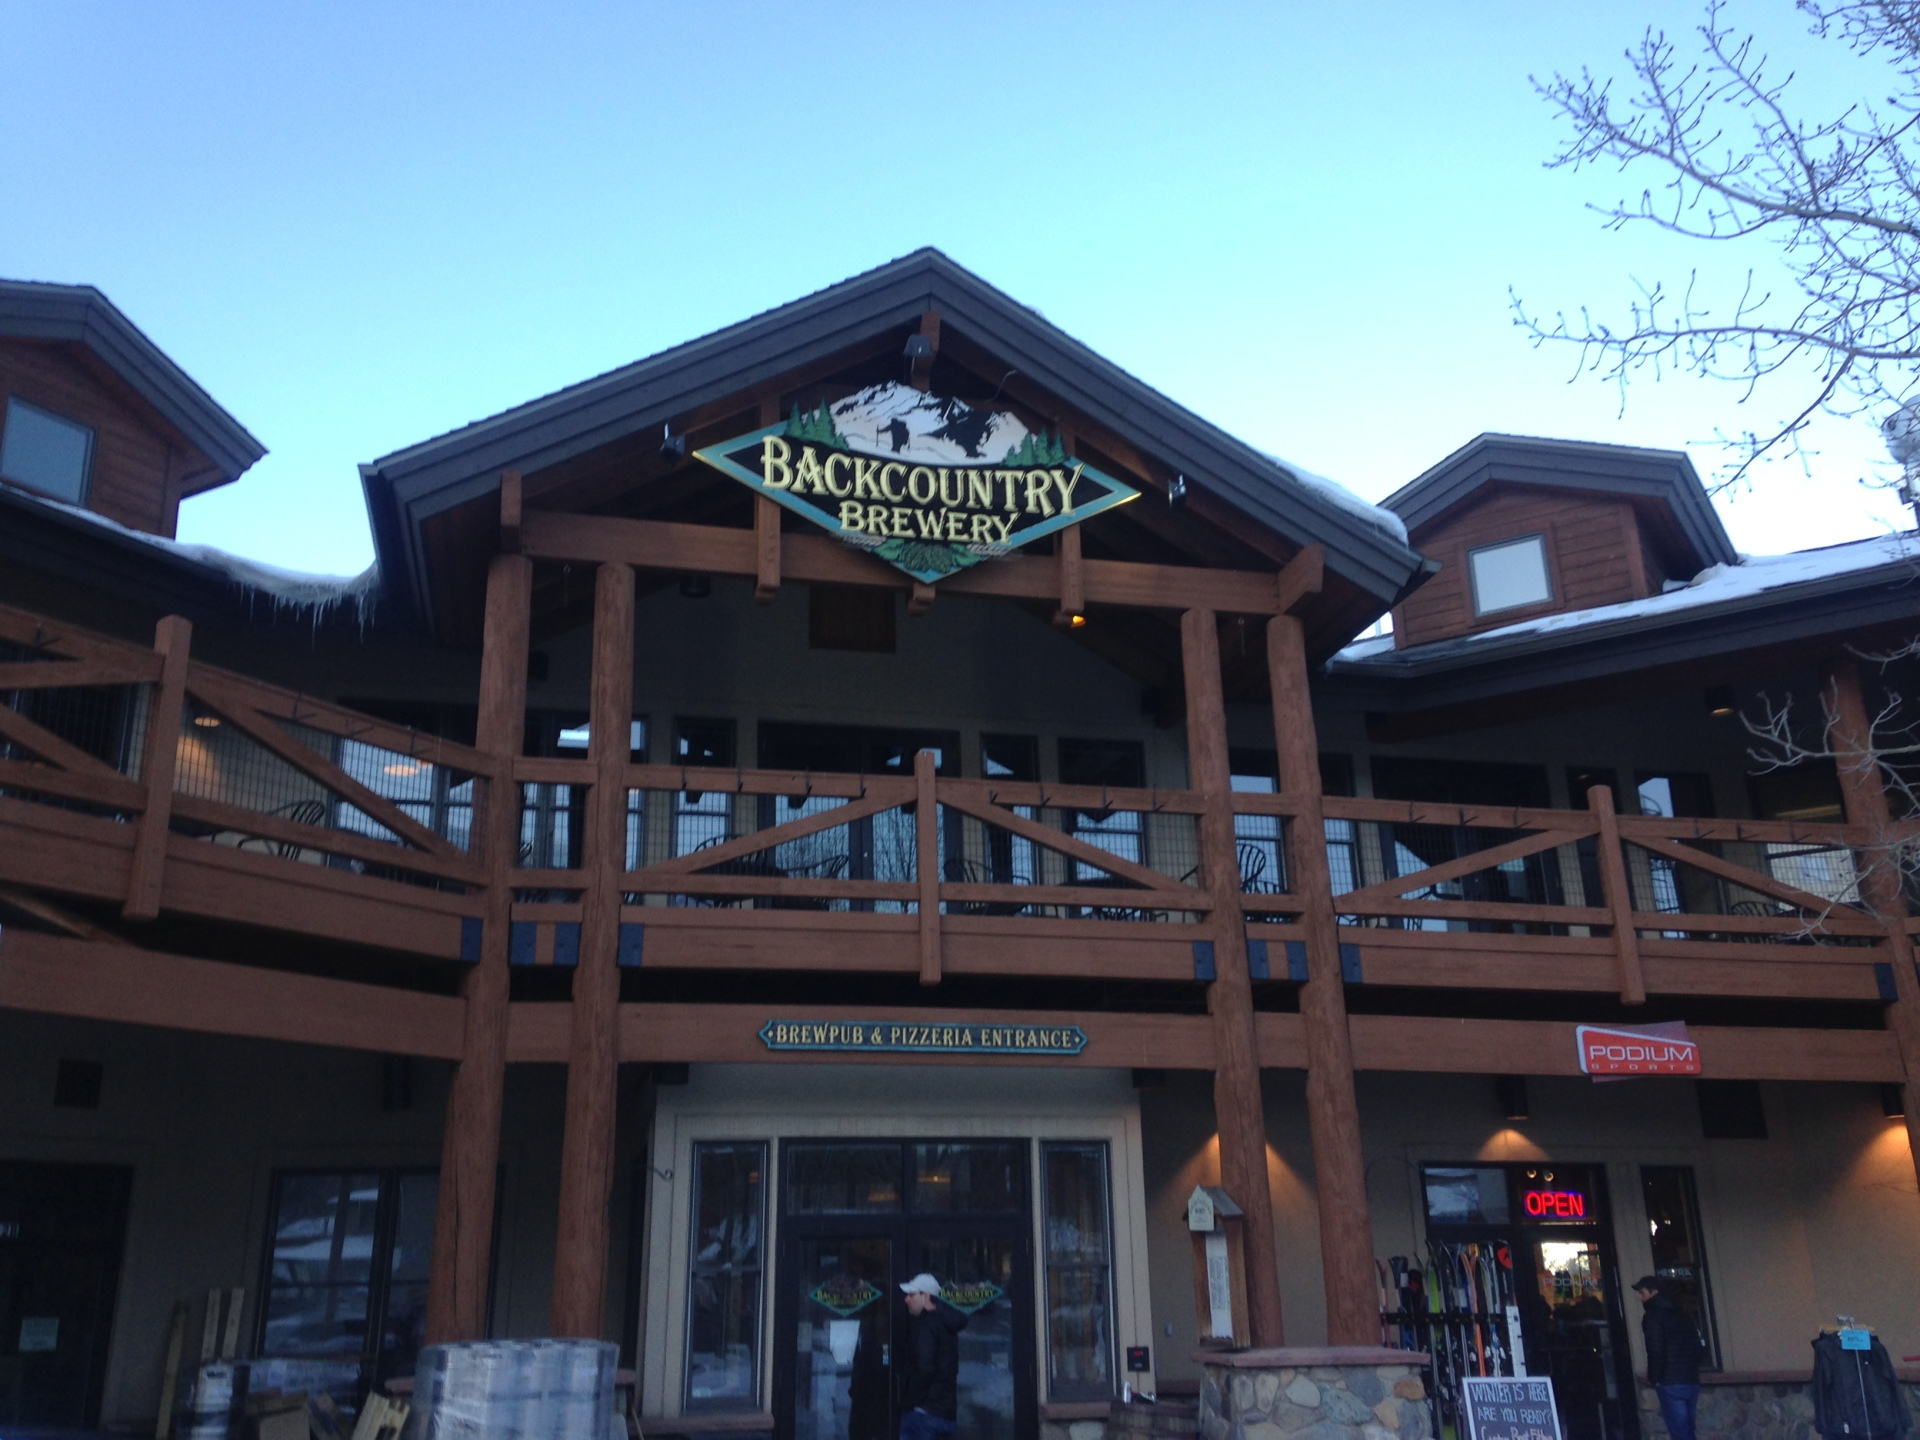 backcountry brewery, frisco, colorado